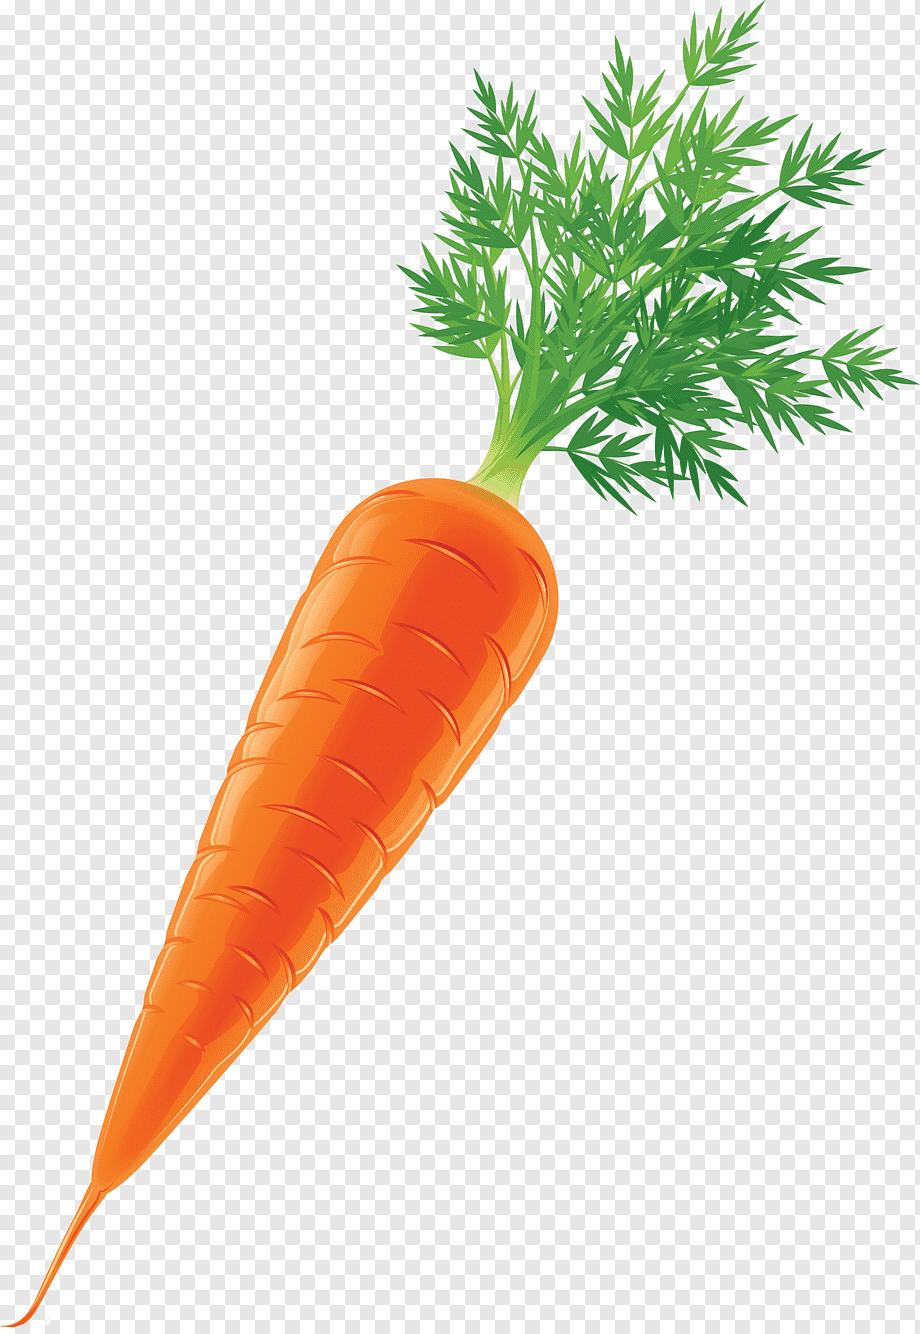 Gambar Sayuran Wortel : gambar, sayuran, wortel, Sayuran, Wortel,, Makanan, Alami,, Makanan,, Jeruk, PNGWing